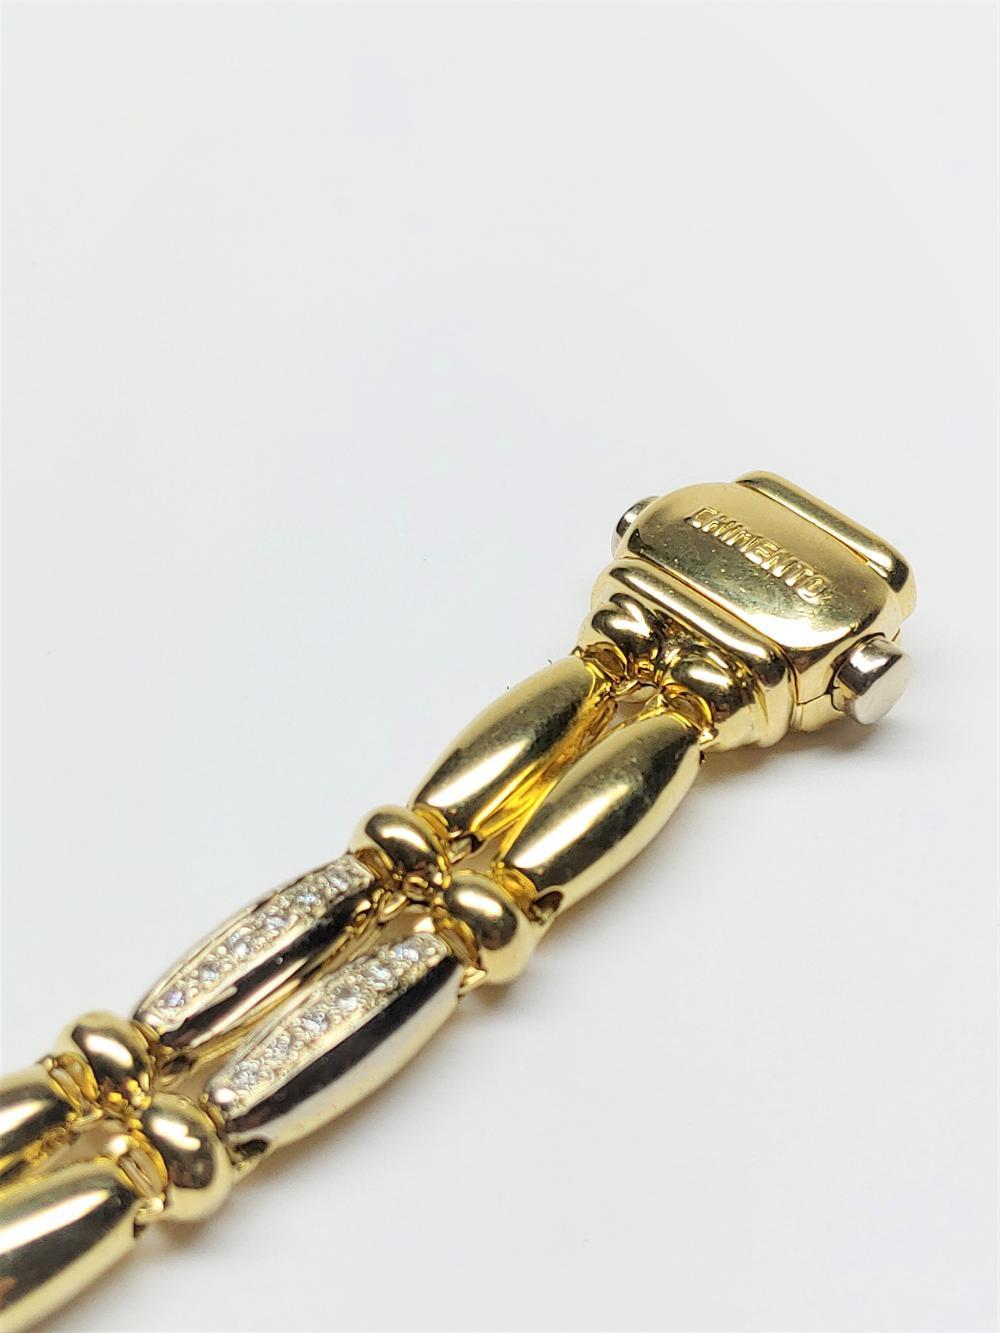 Lot 52: Chimento 18k Yellow Gold Diamond Bracelet Approx 1.50 TCW Retail Price $12k